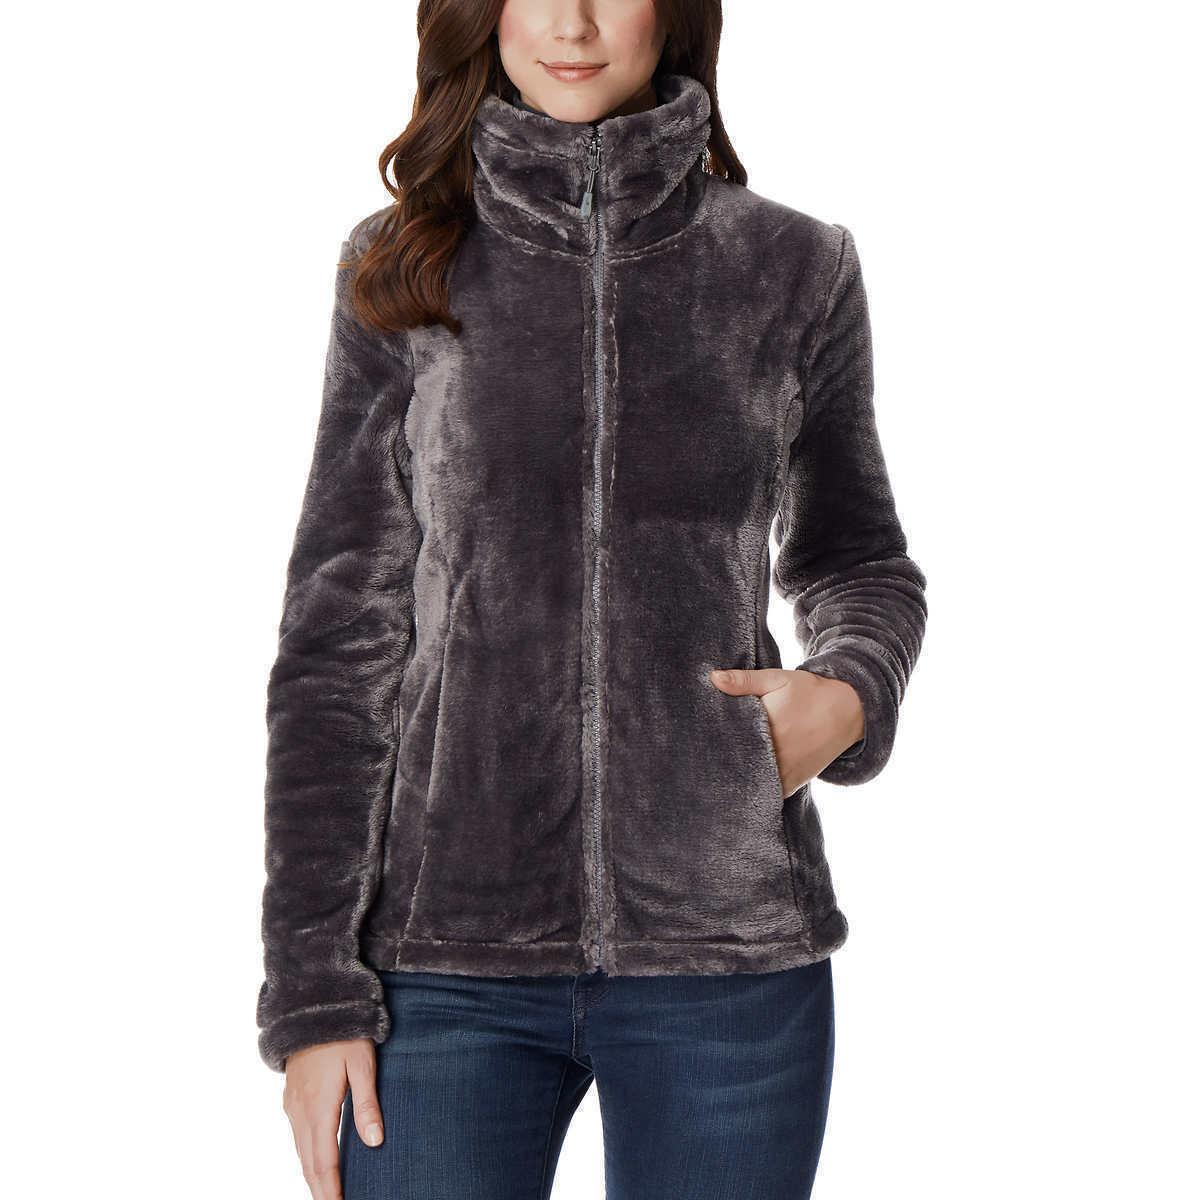 32 Degrees Ladies' Shadow Gray Soft Plush Heat Faux Fur Jacket size M Medium